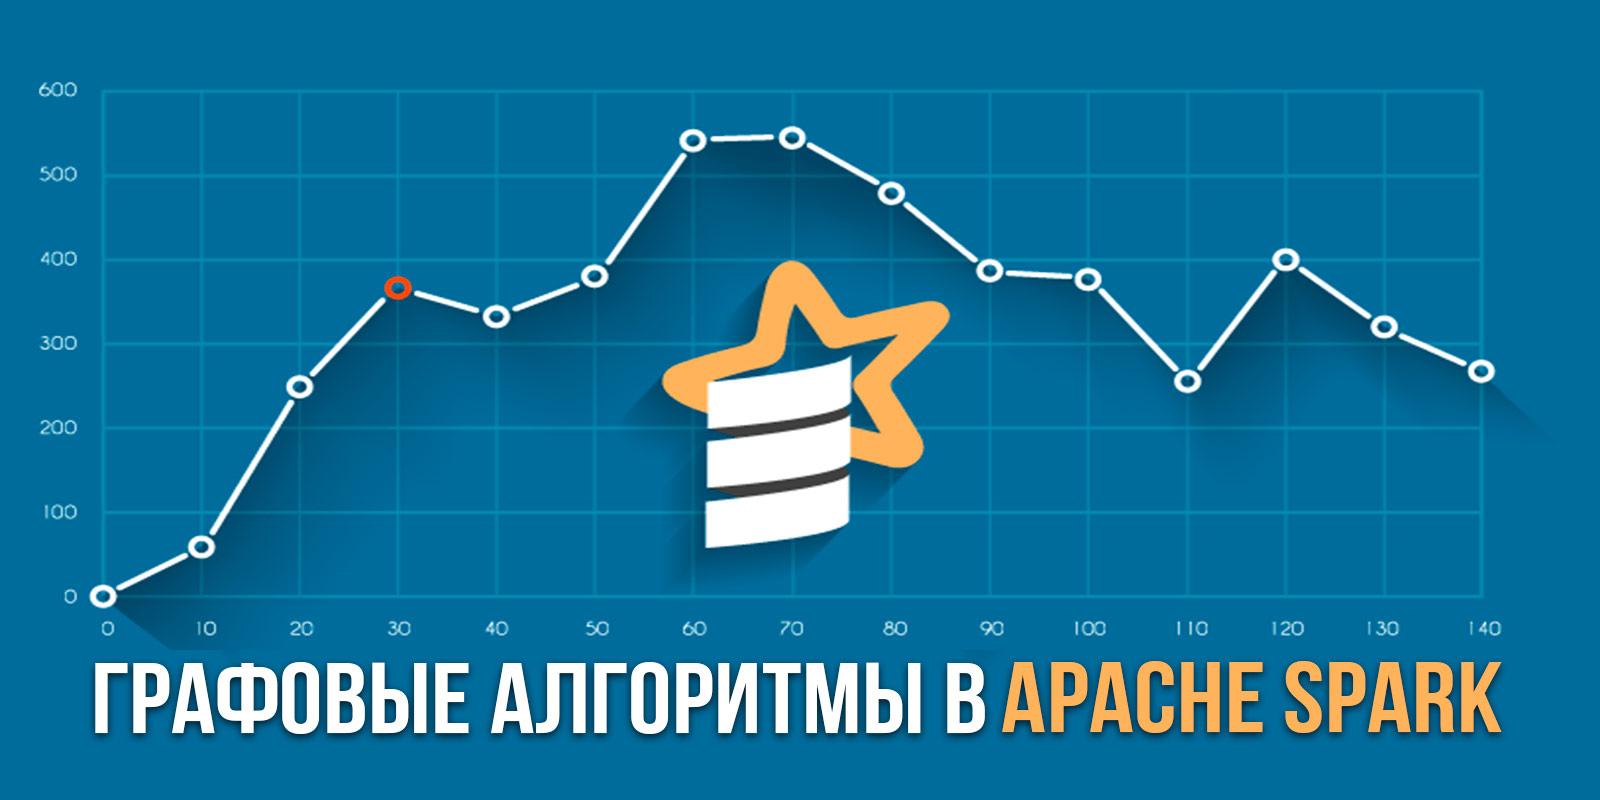 GRAS: Графовые алгоритмы в Apache Spark